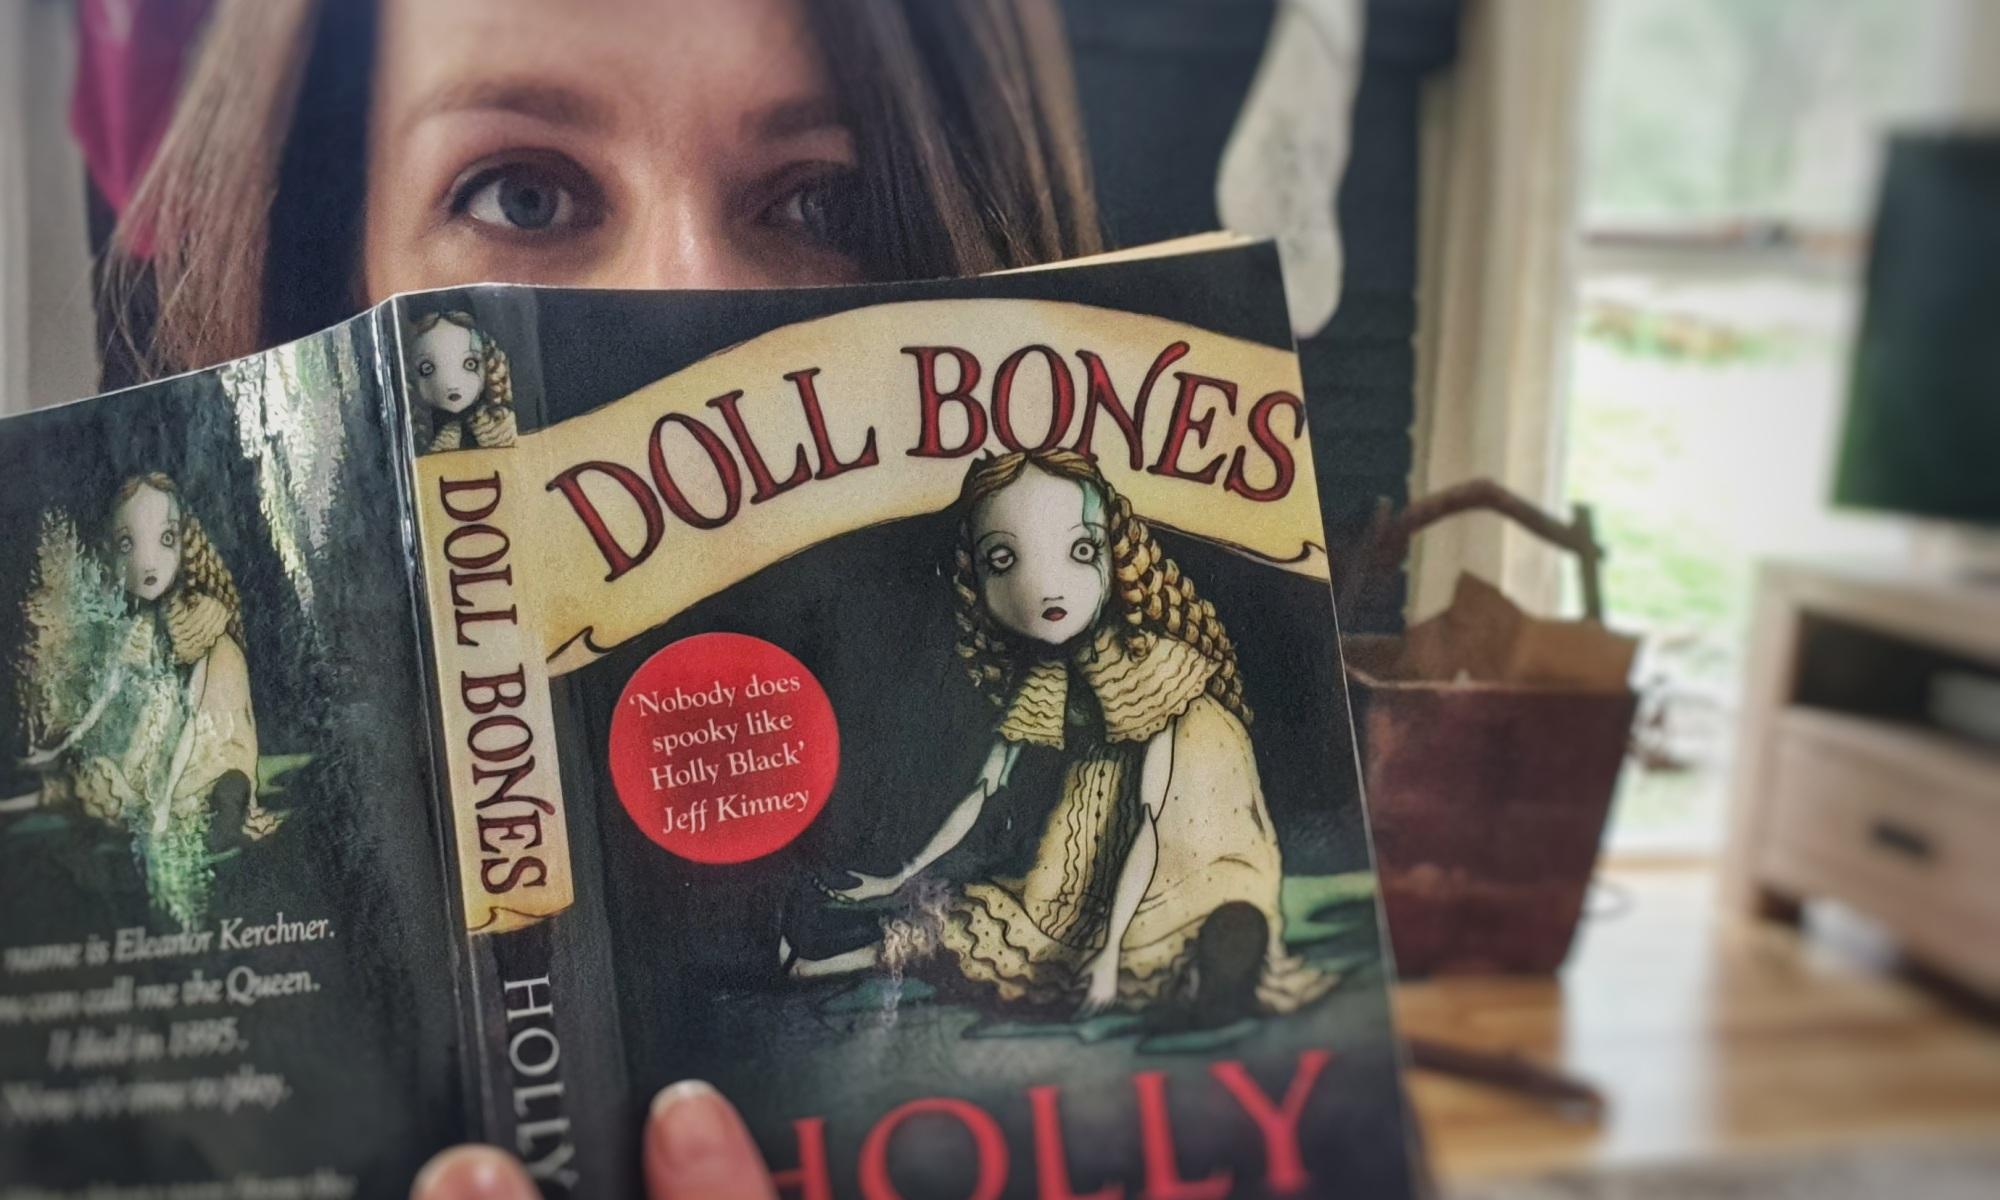 Doll Bones, a book review by Geni Kuckhahn